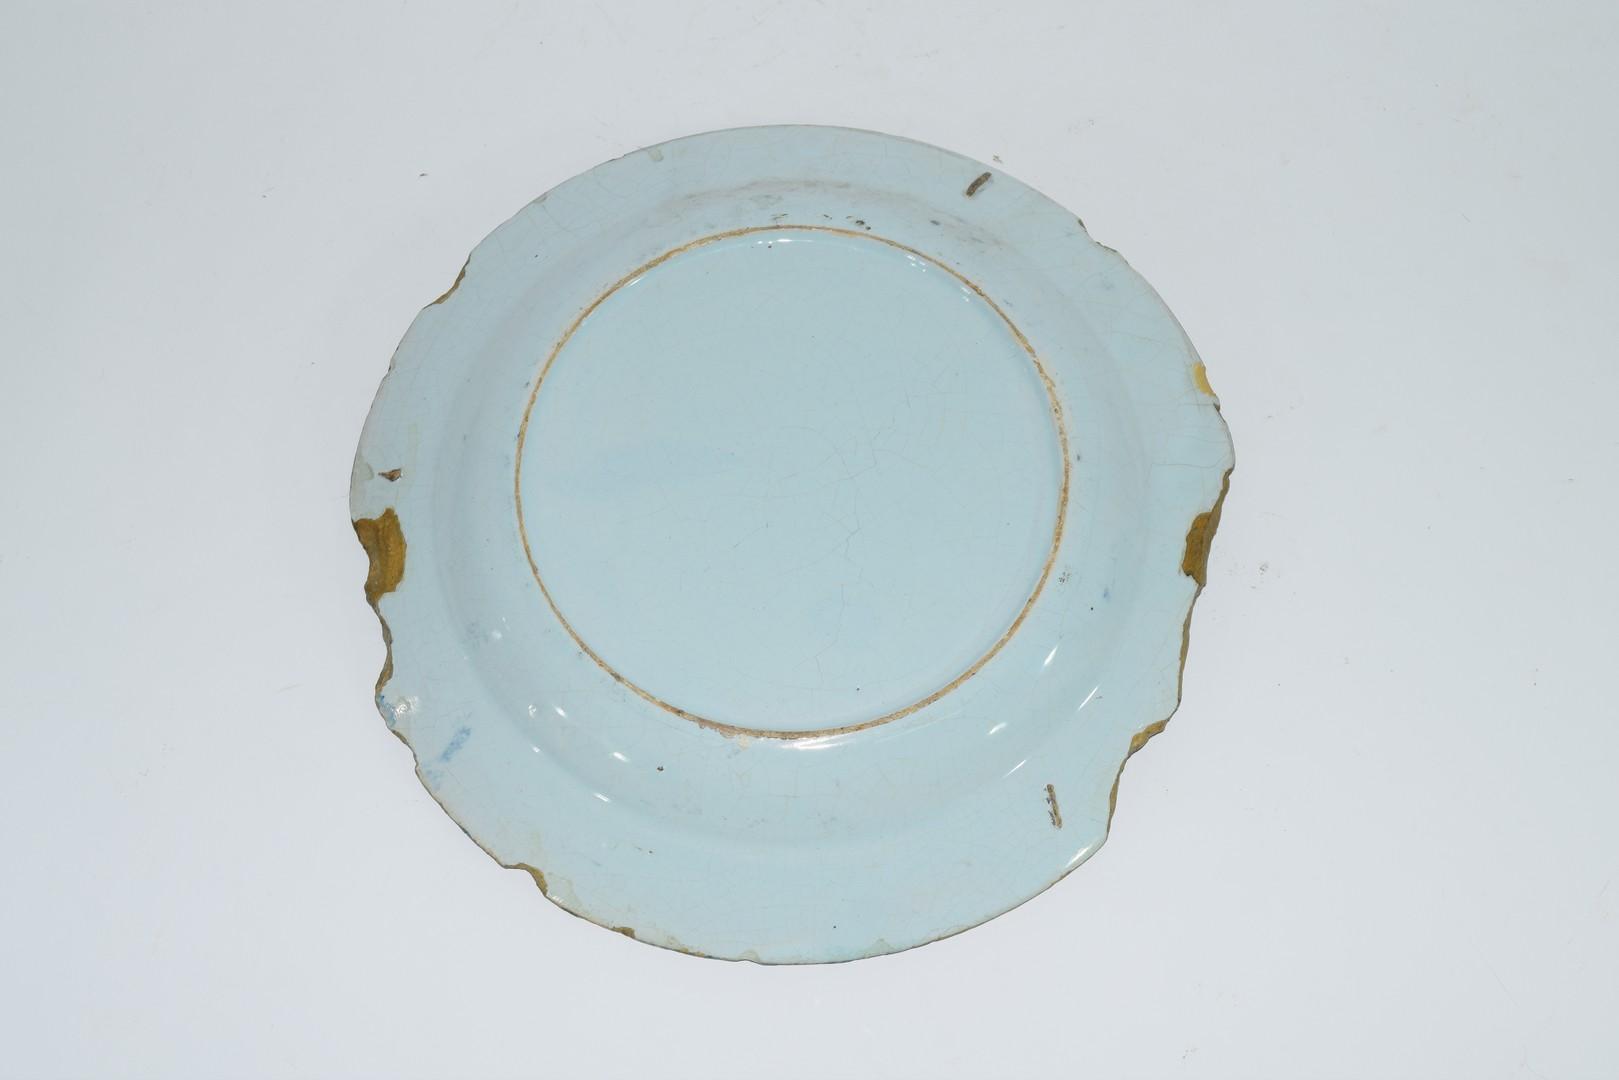 Three 18th century English Delft plates - Image 5 of 7